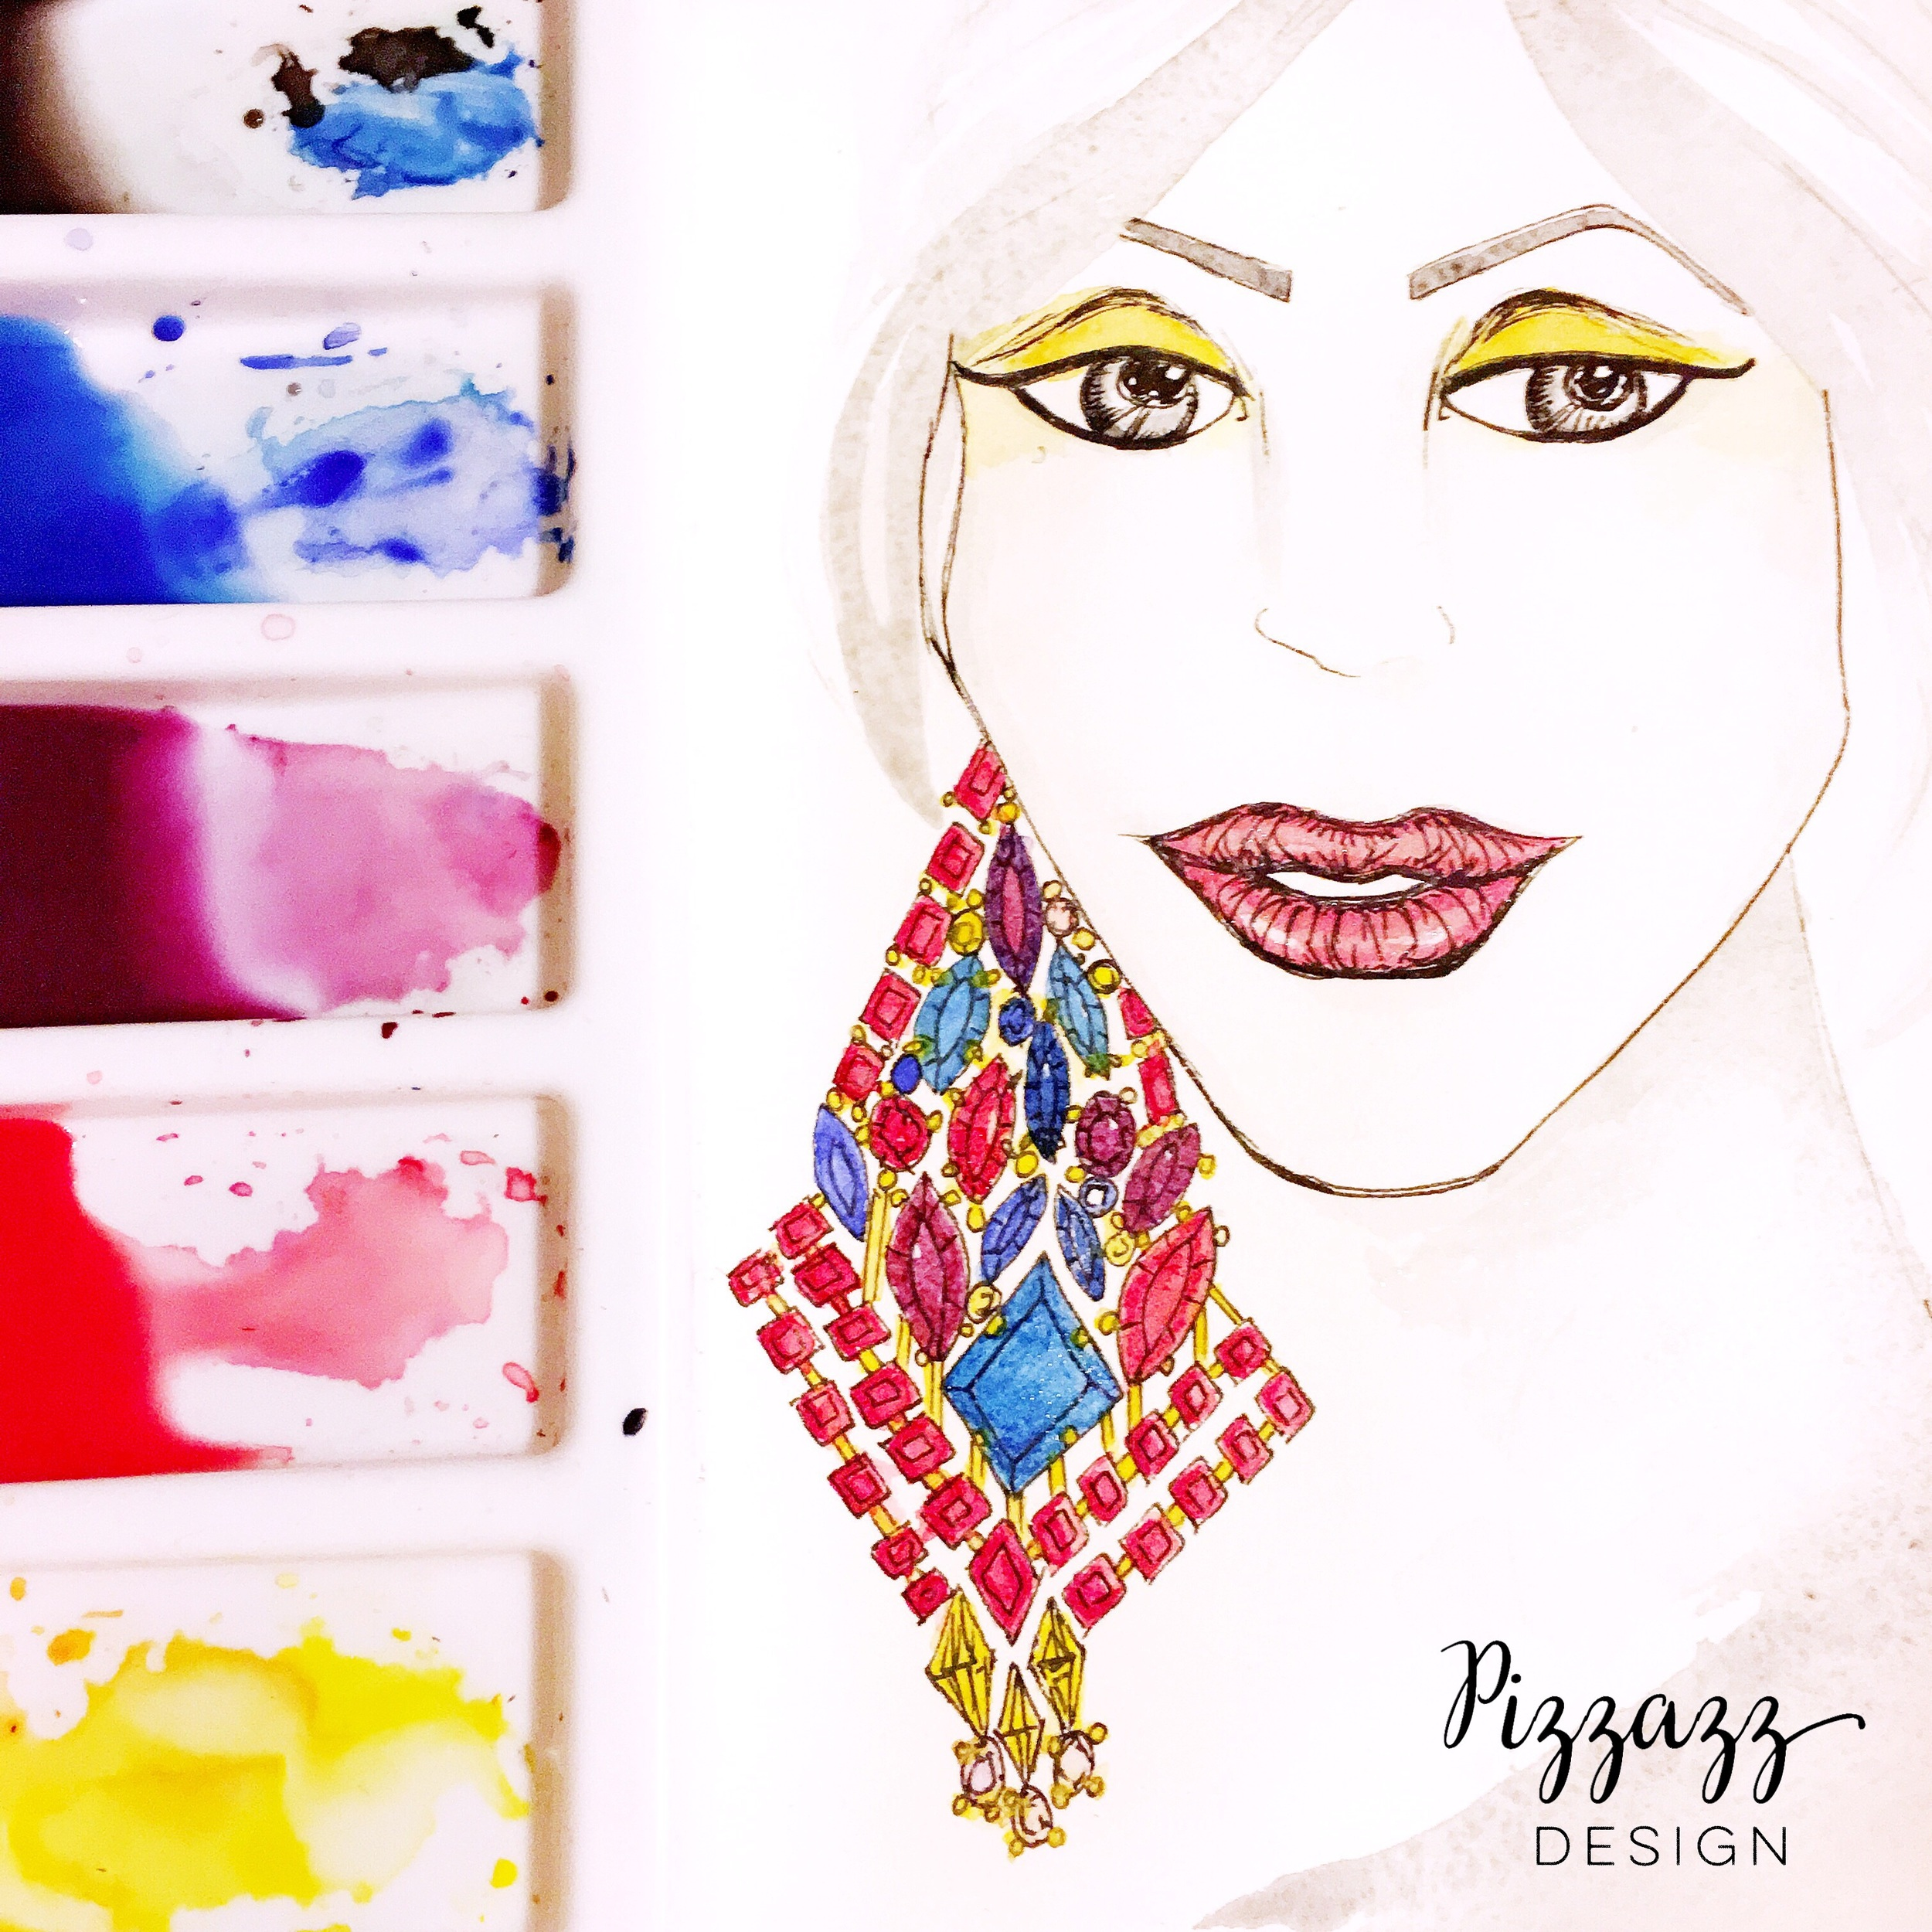 Holiday Winter Portrait Fashion Illustration. Pizzazz Design.